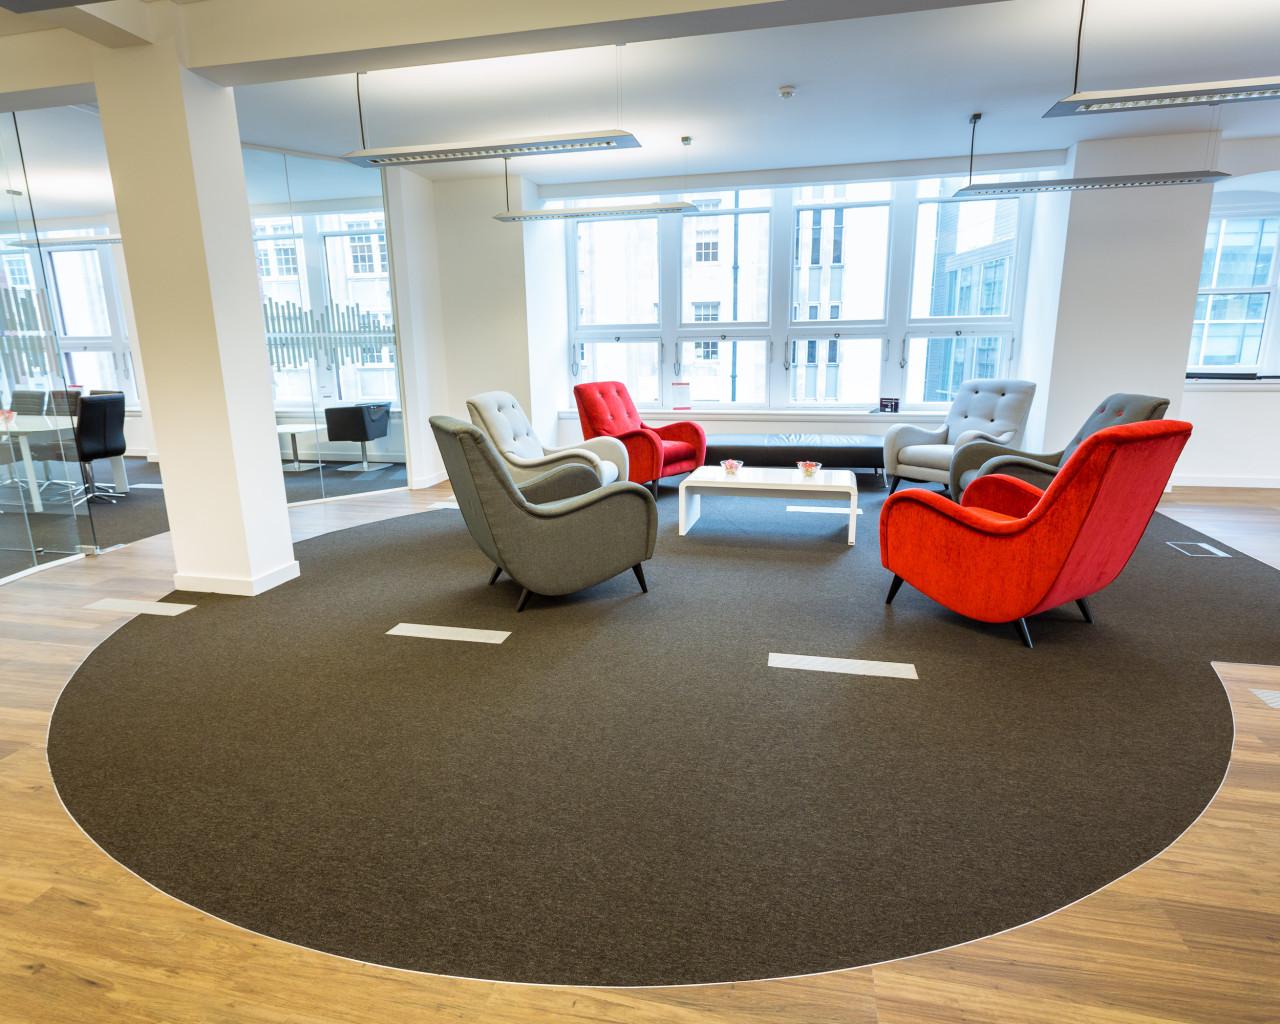 Office interior design services bolton manchester for Office interior decoration services